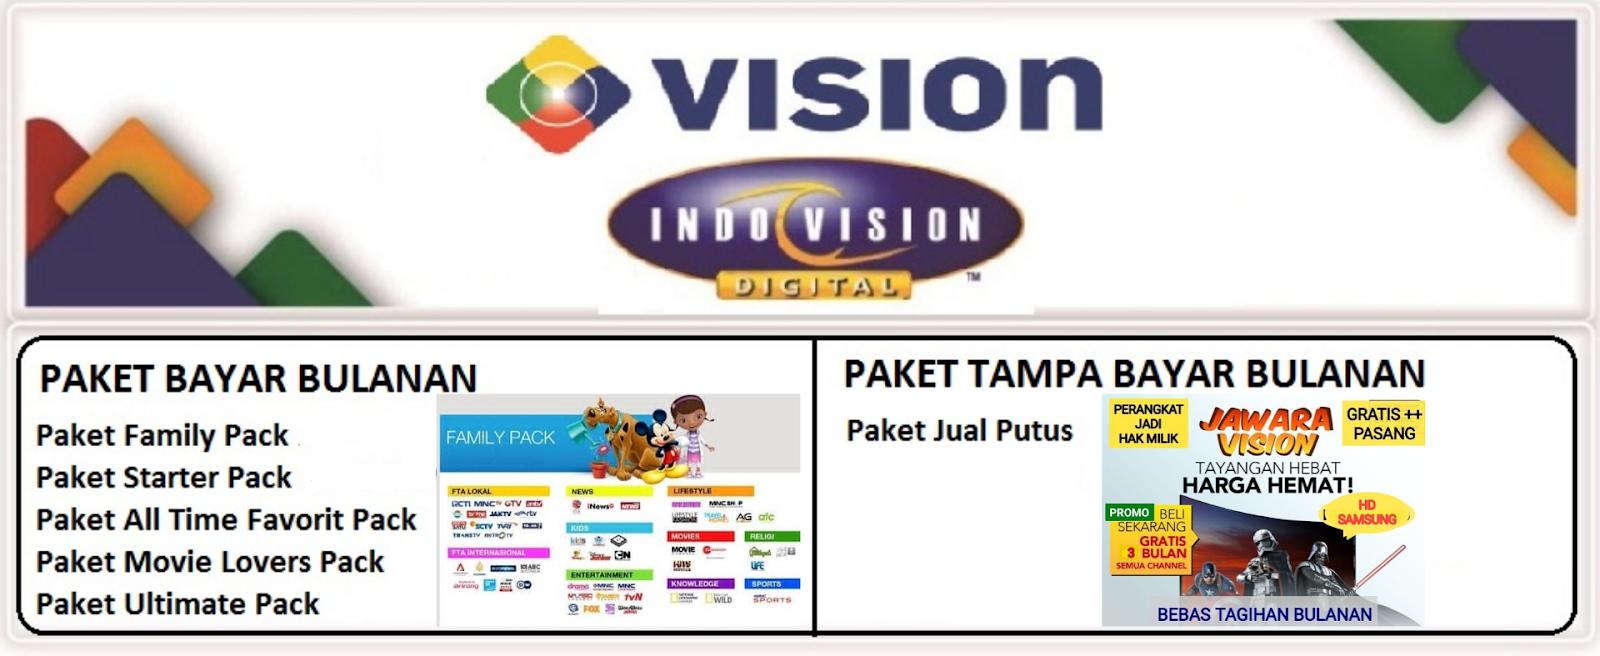 Paket Indovision 2021 Tampa Bayar Bulanan September 2021 Mnc Vision Indovision